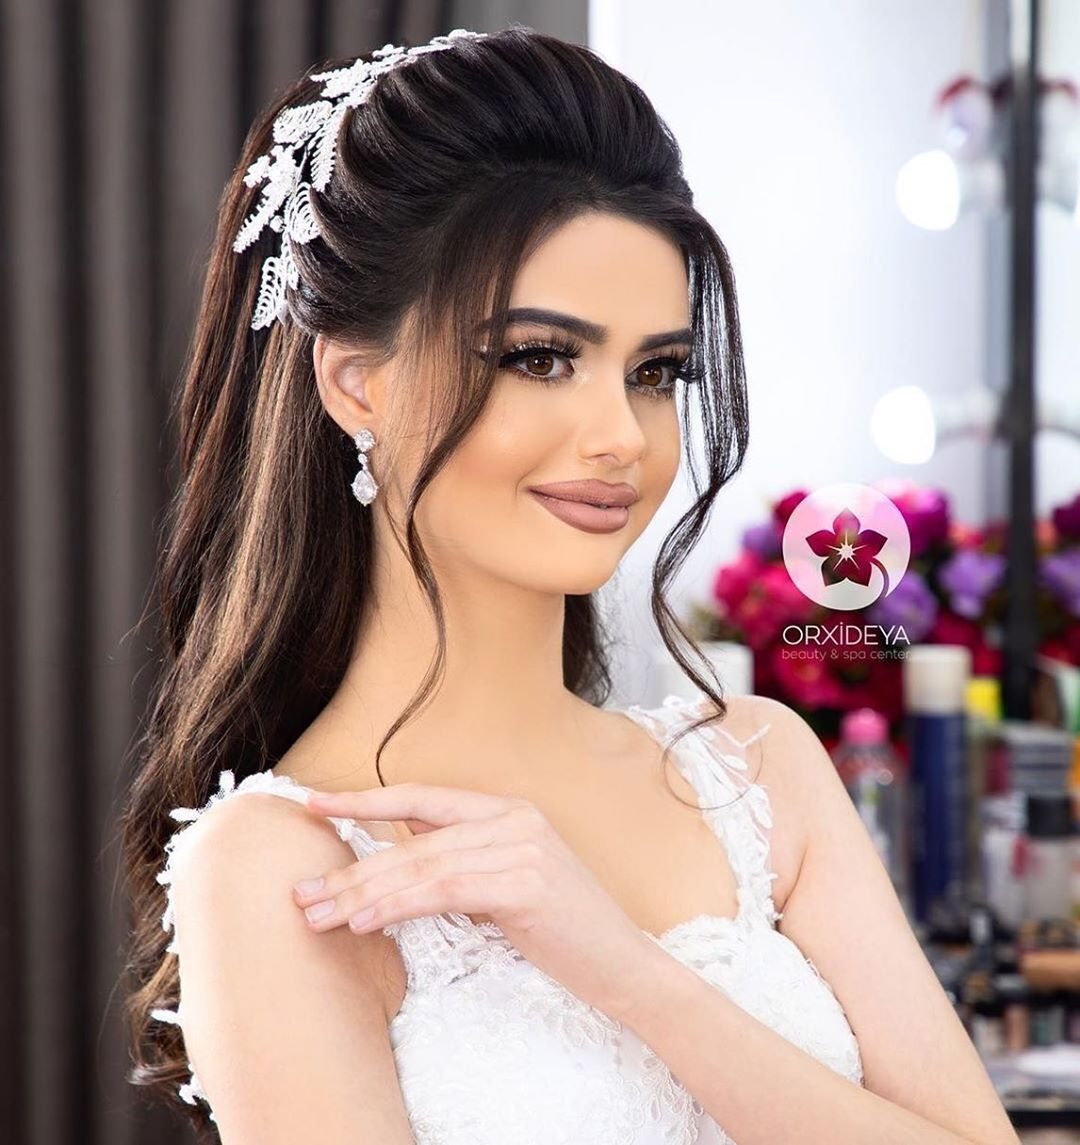 31 Likes 0 Comments Gelin Sac Makiyaj Wedding Orxideyabeauty Vip On Instagram Sac Bridal Hair Buns Front Hair Styles Bridal Hairstyle Indian Wedding